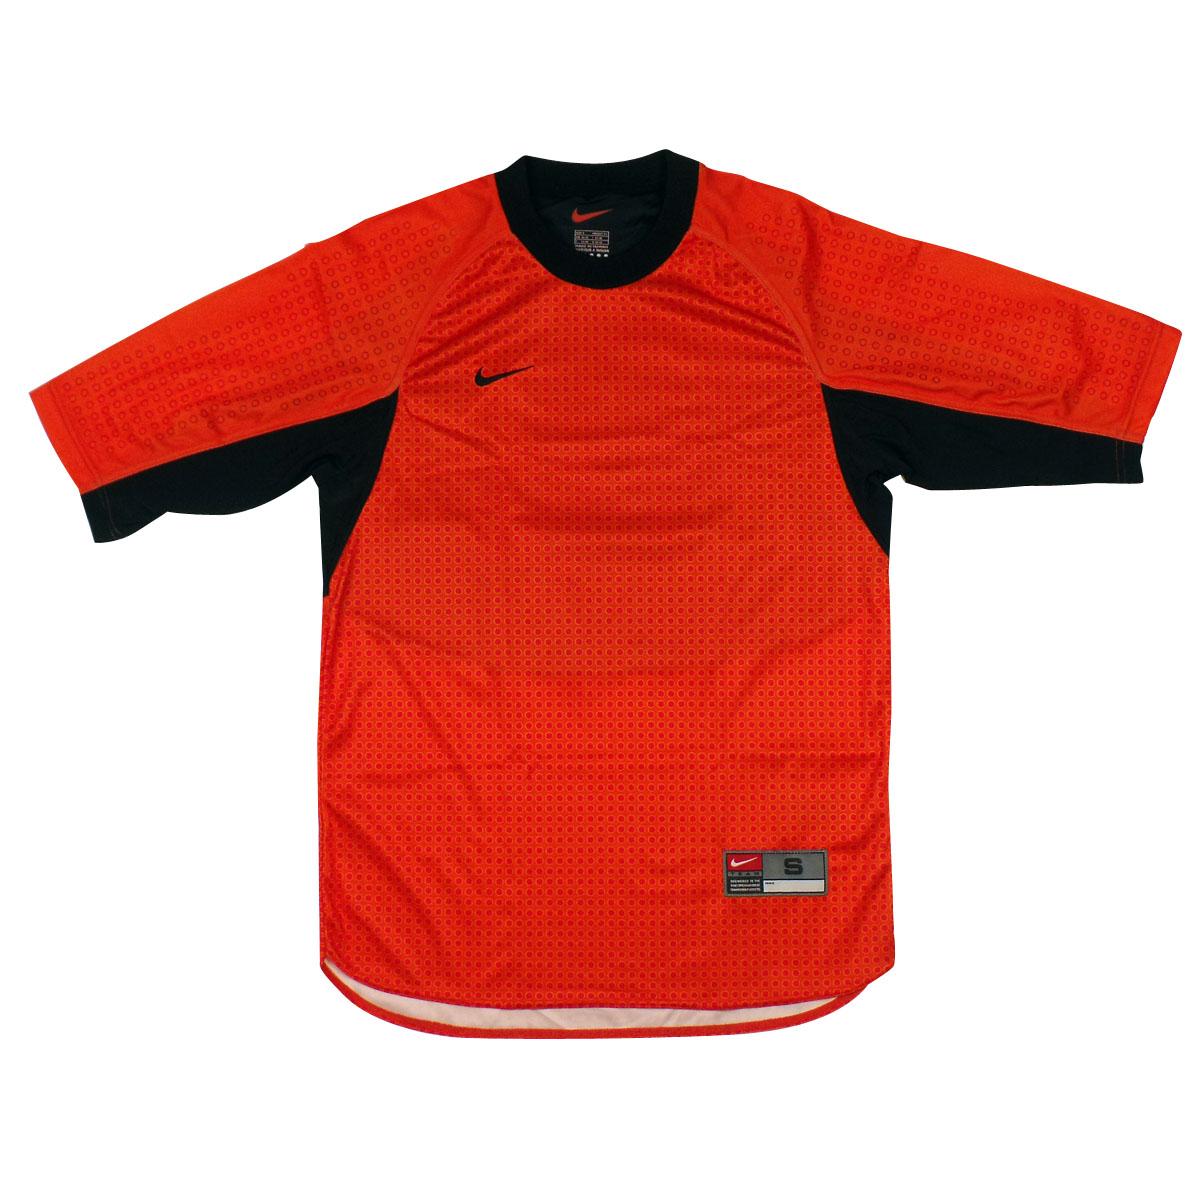 Mens Nike Mercurial Dry Dri Fit Running Shirt Top T Shirt